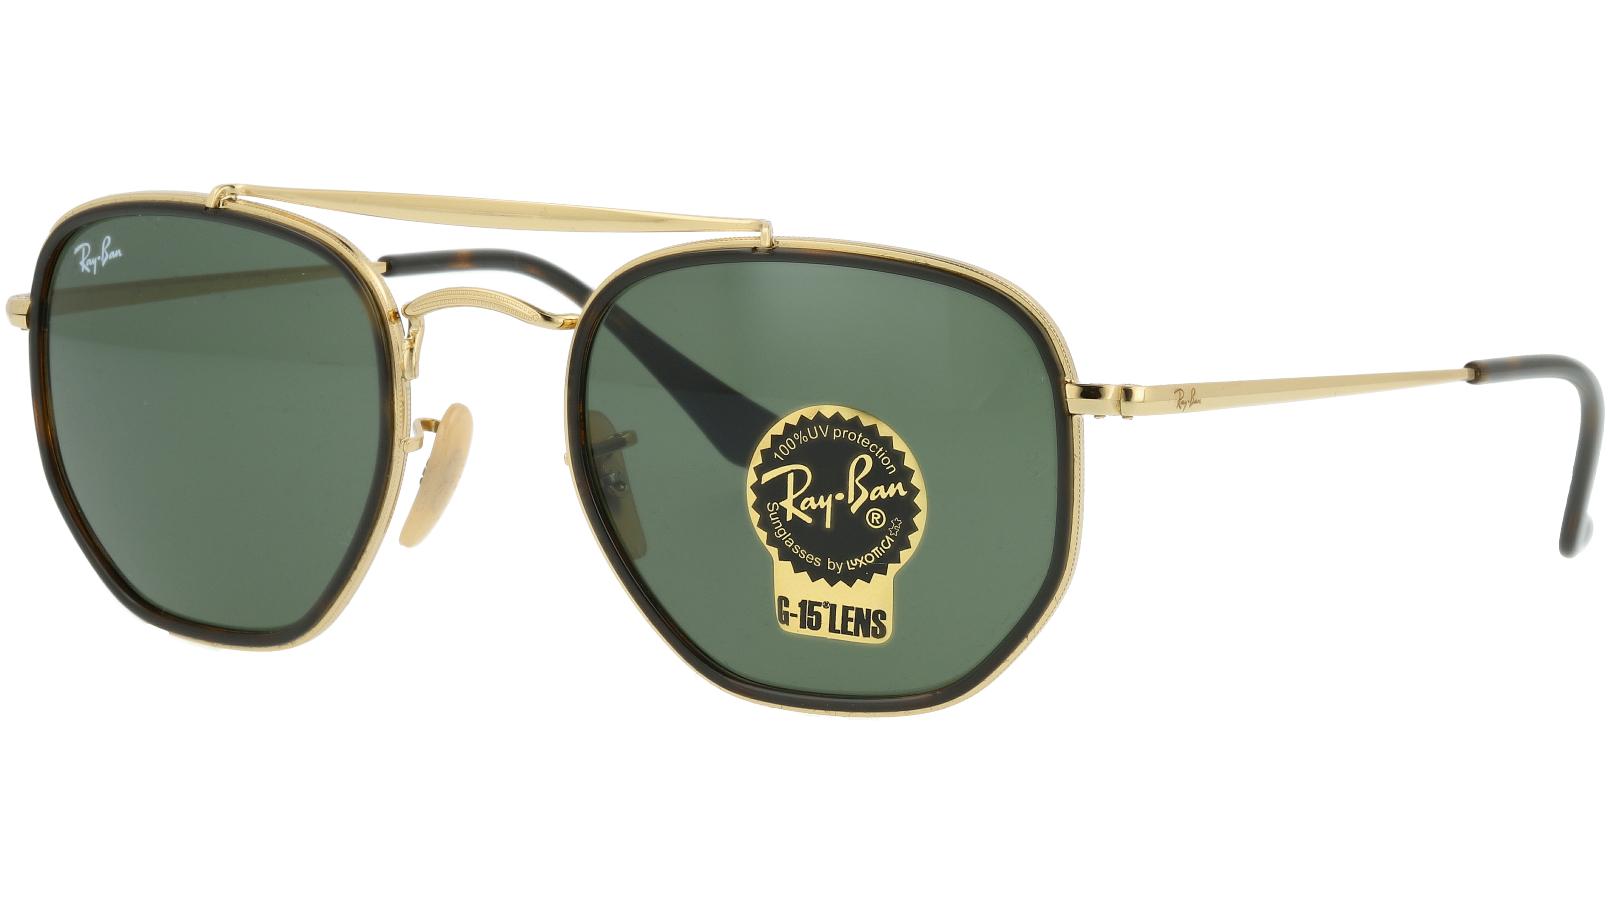 Ray-Ban RB3648M 001 52 Arista Sunglasses